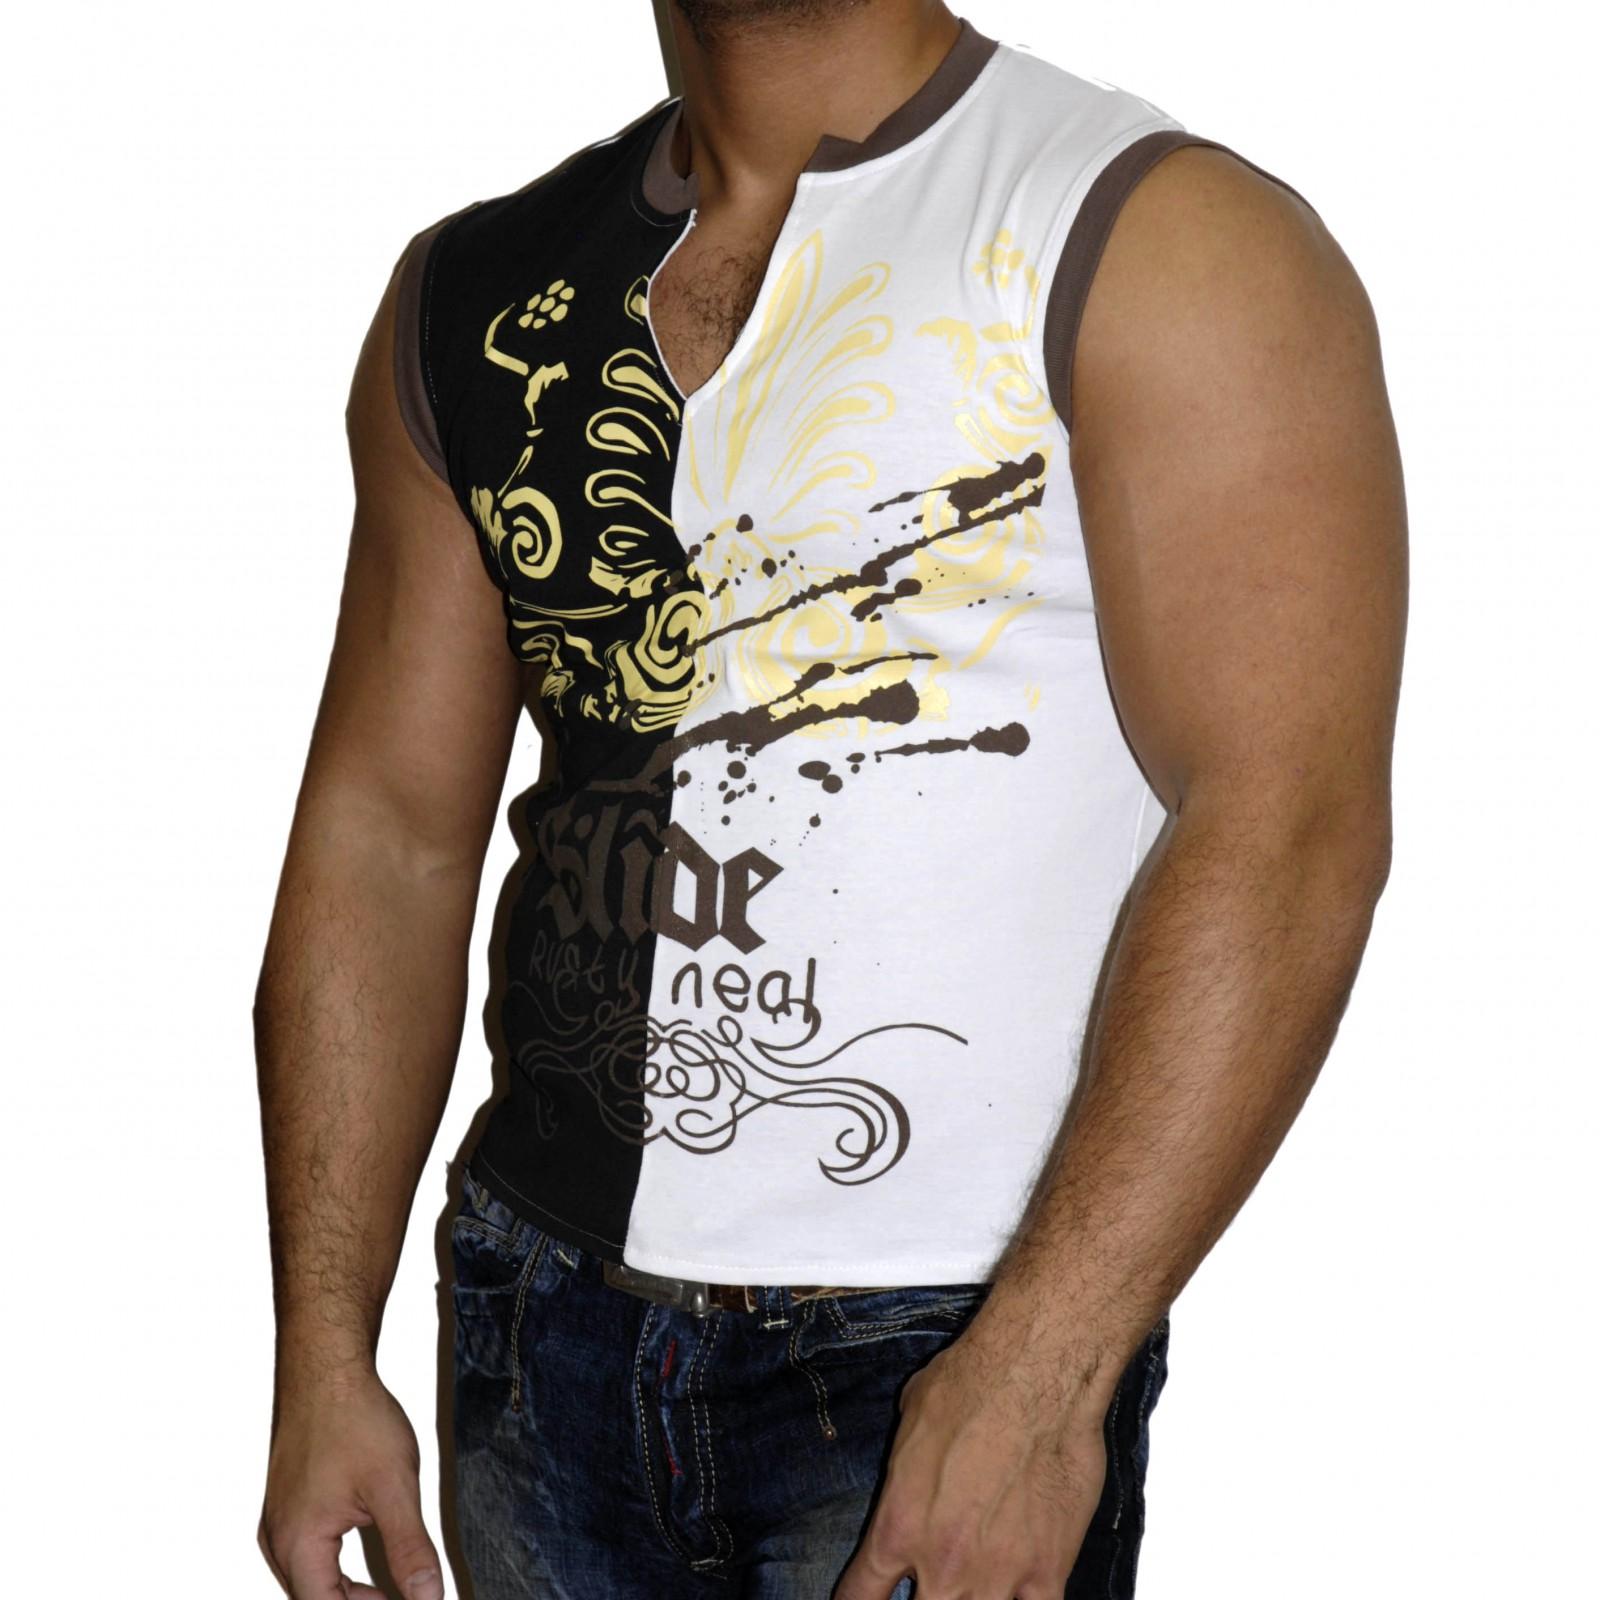 T-Shirt Weiß 844 Rusty Neal